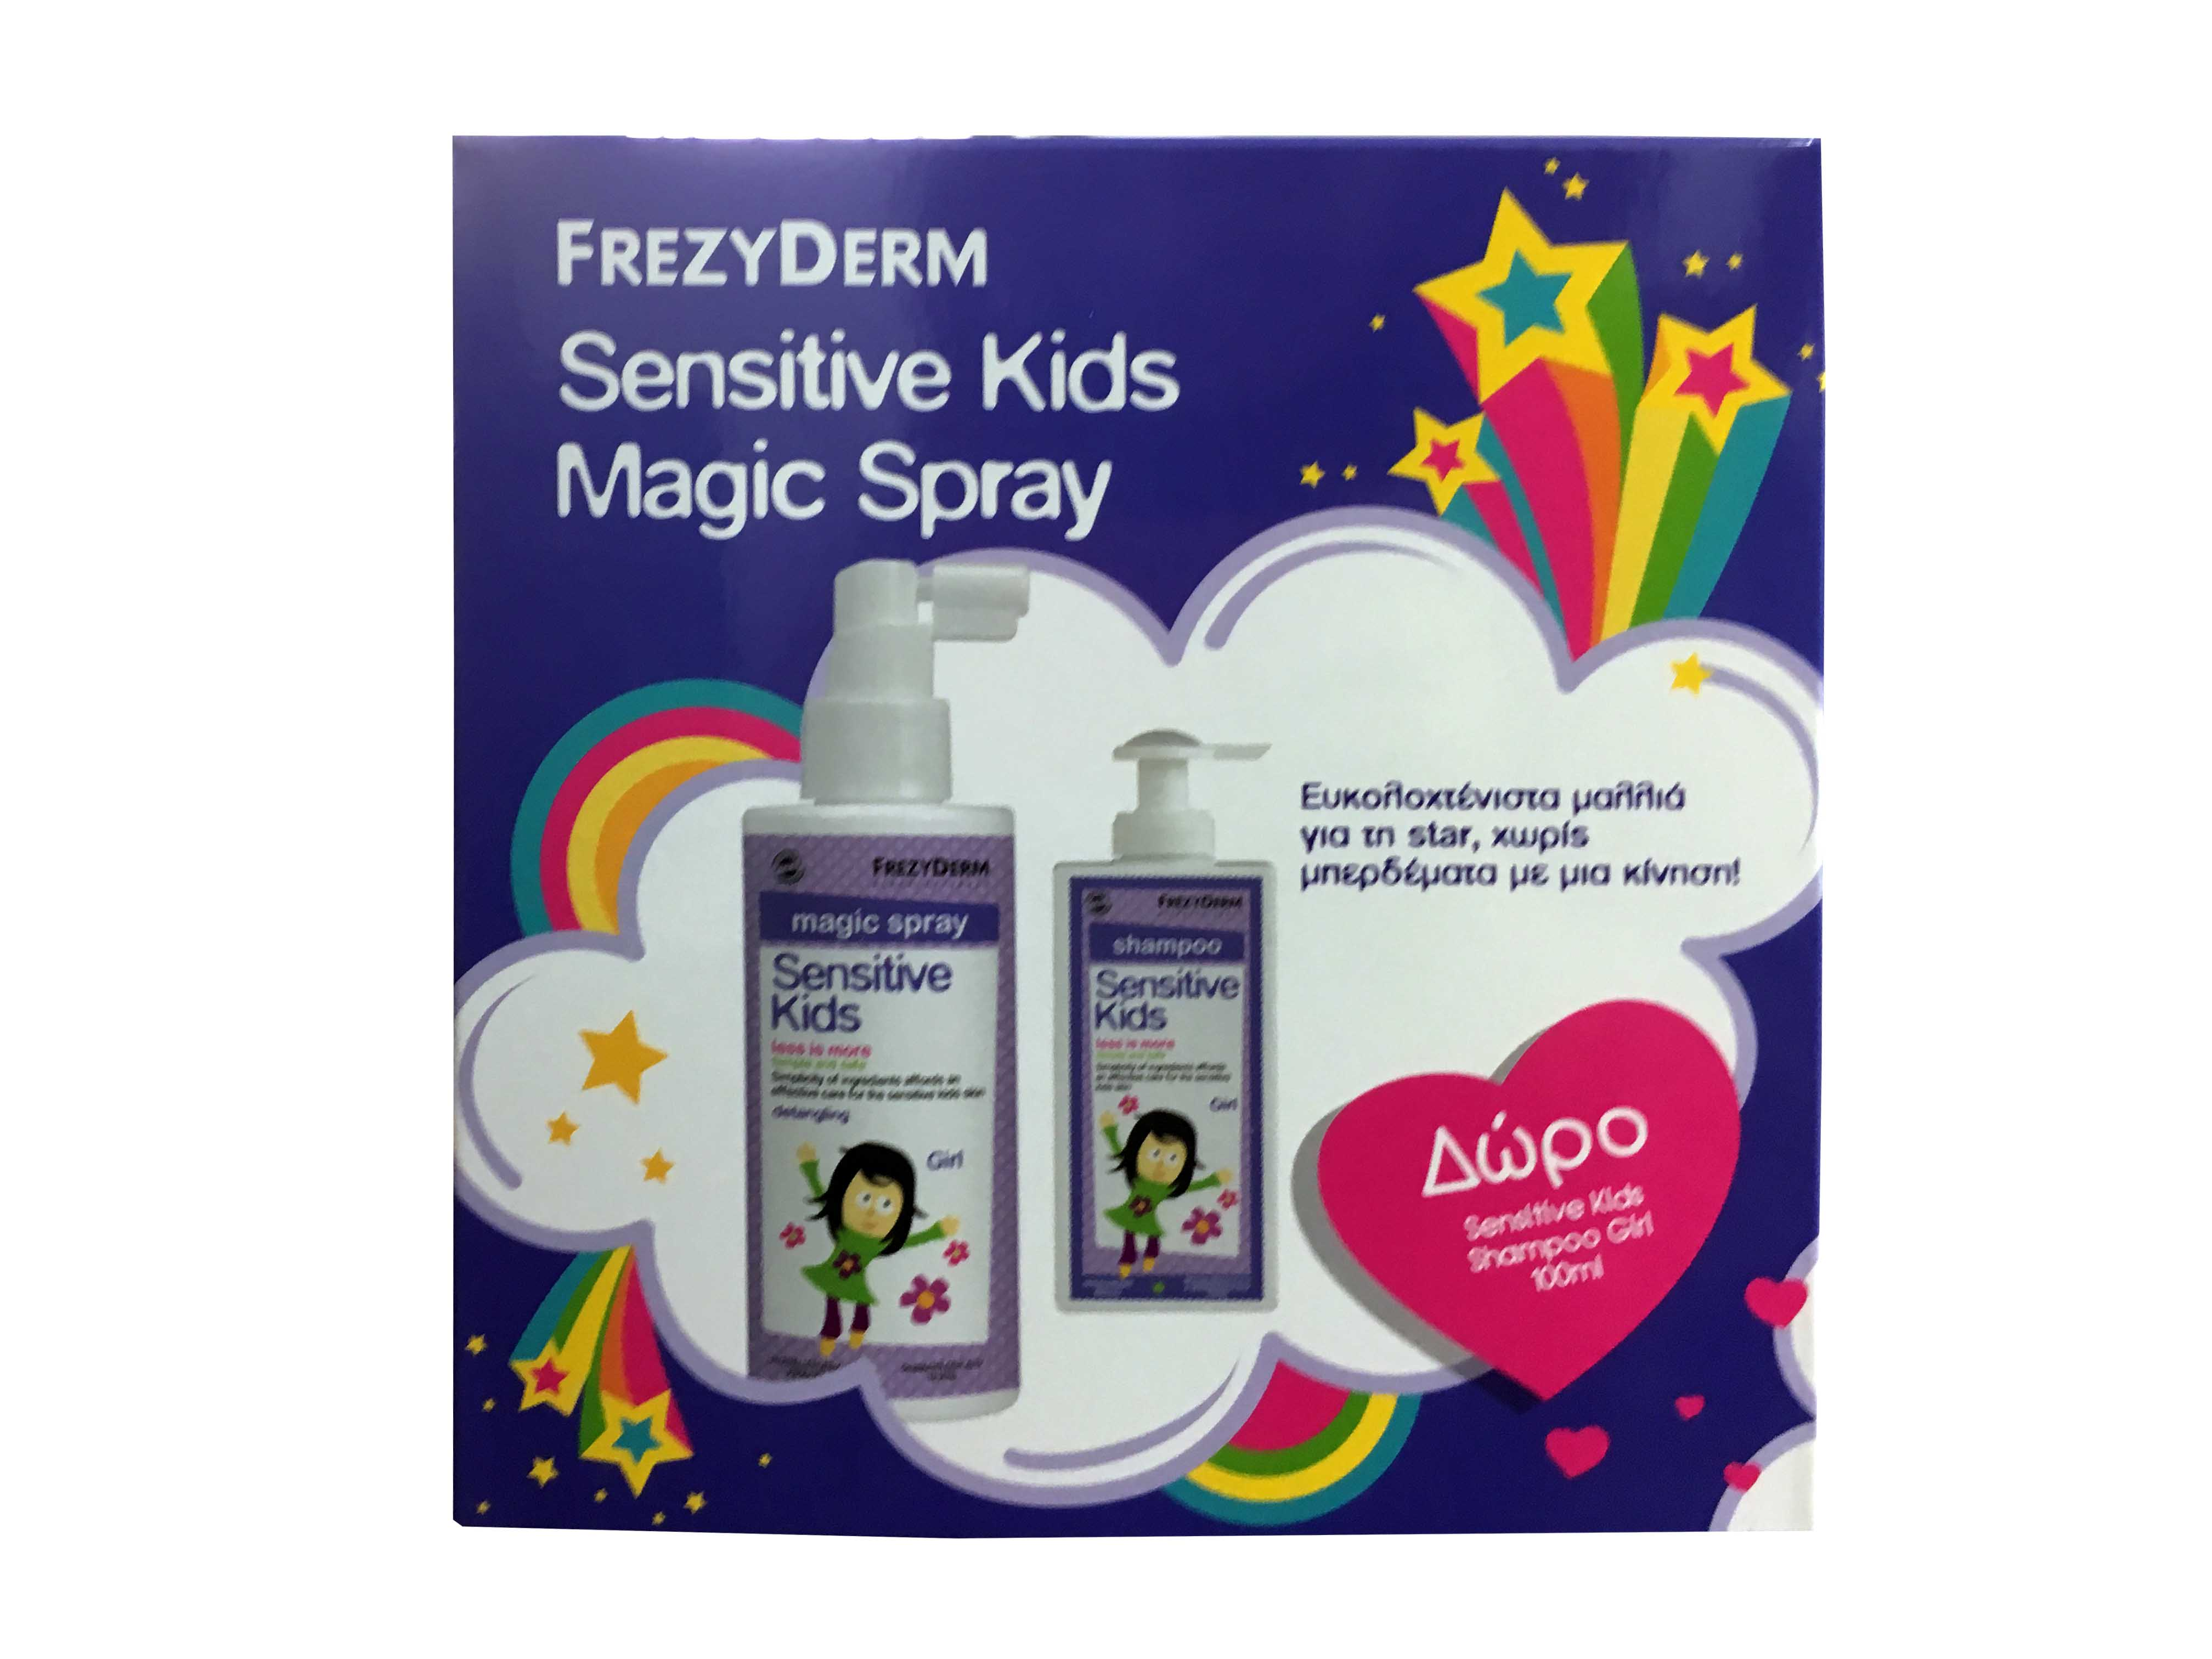 Frezyderm Sensitive Kids Magic Spray for Girls Αρωματική Λοσιόν που ξεμπερδεύει τα μαλλάκια,150ml & ΔΩΡΟ Sensitive Kids Shampoo Girl Εξειδικευμένο Σαμπουάν για κορίτσια, 100ml